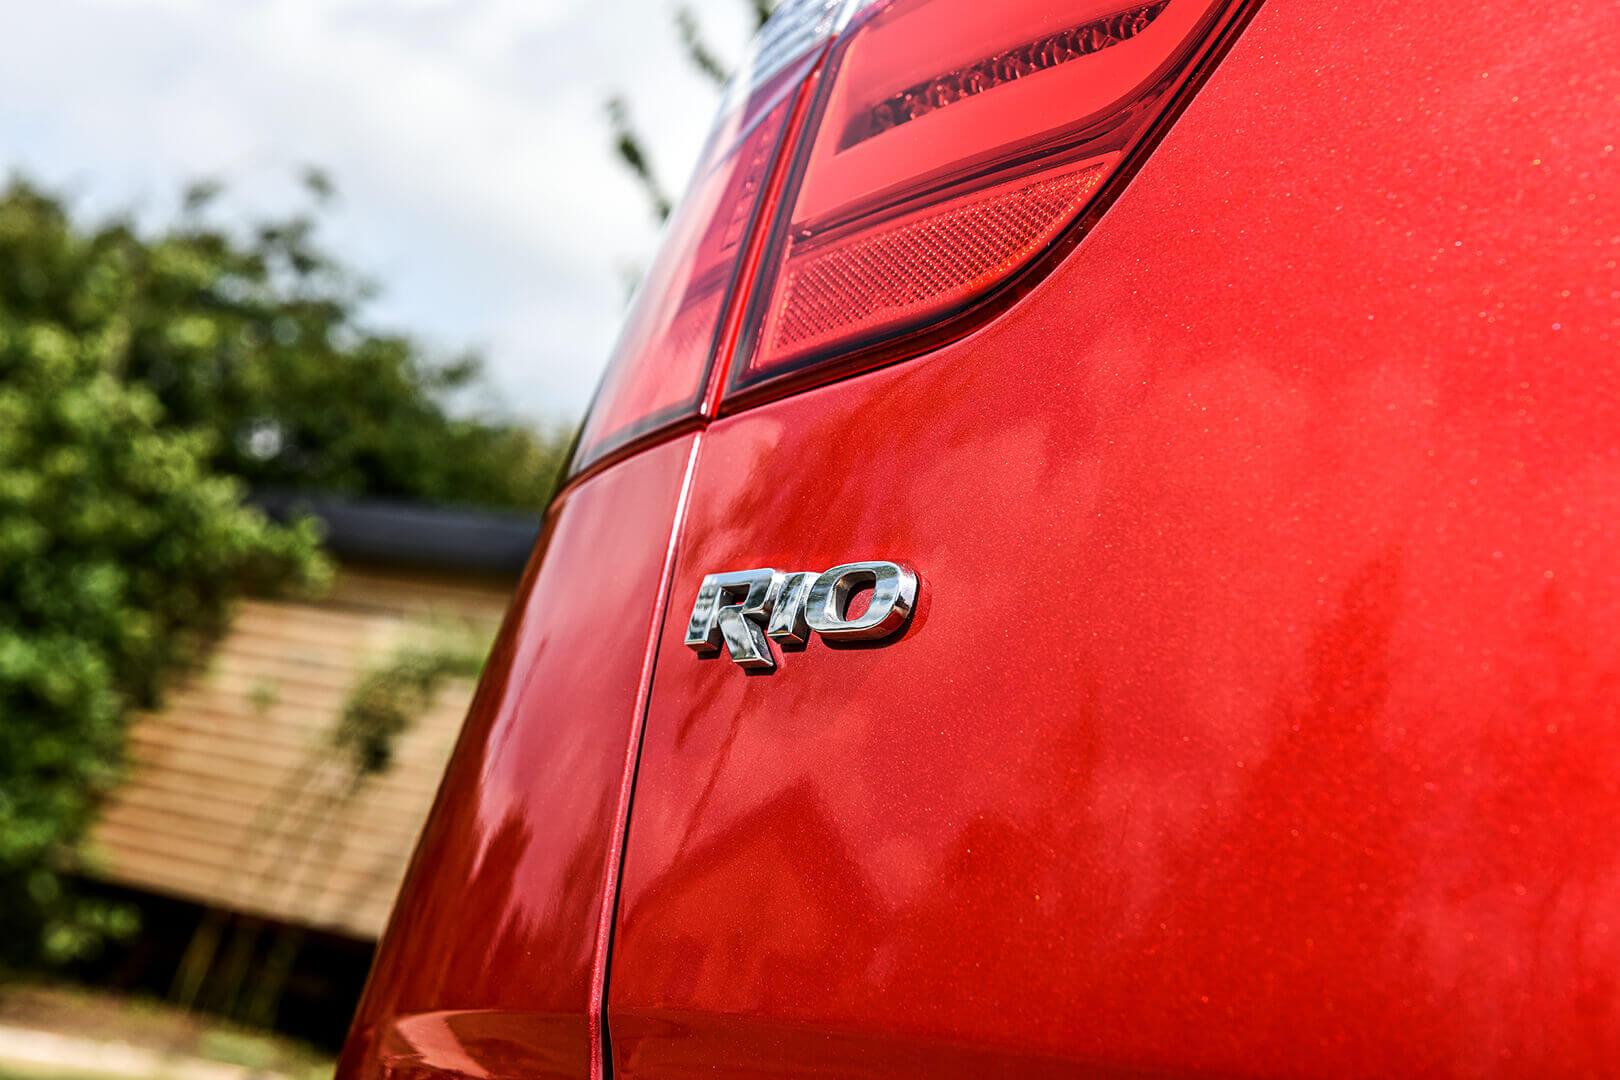 UV Privacy Car Shades (Set of 4) Kia Rio 5dr 11-17